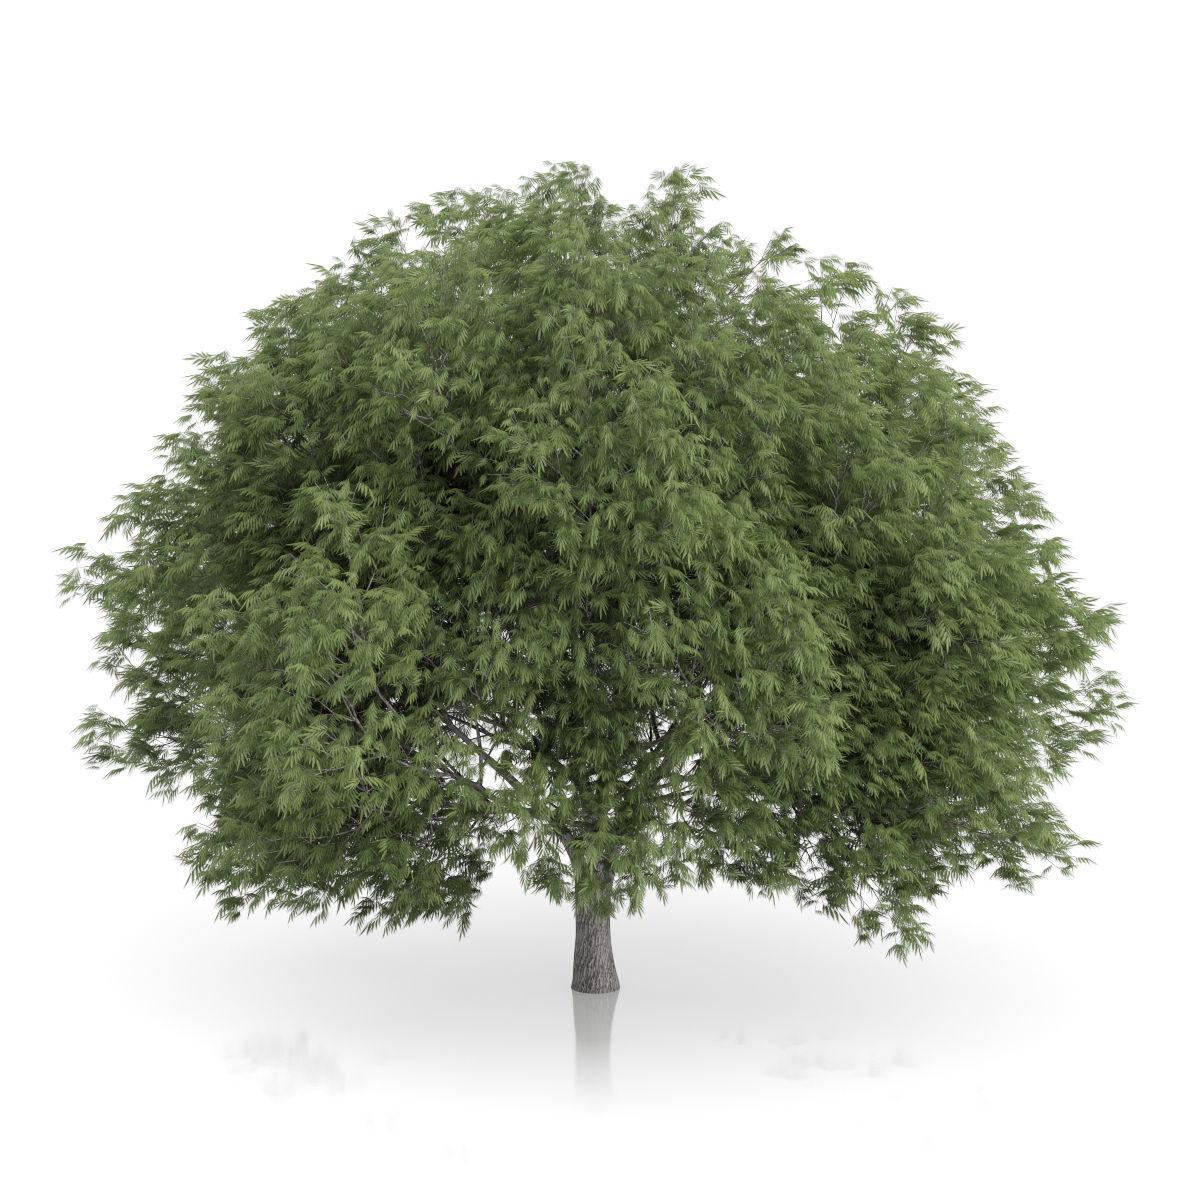 Crack Willow Tree Salix fragilis